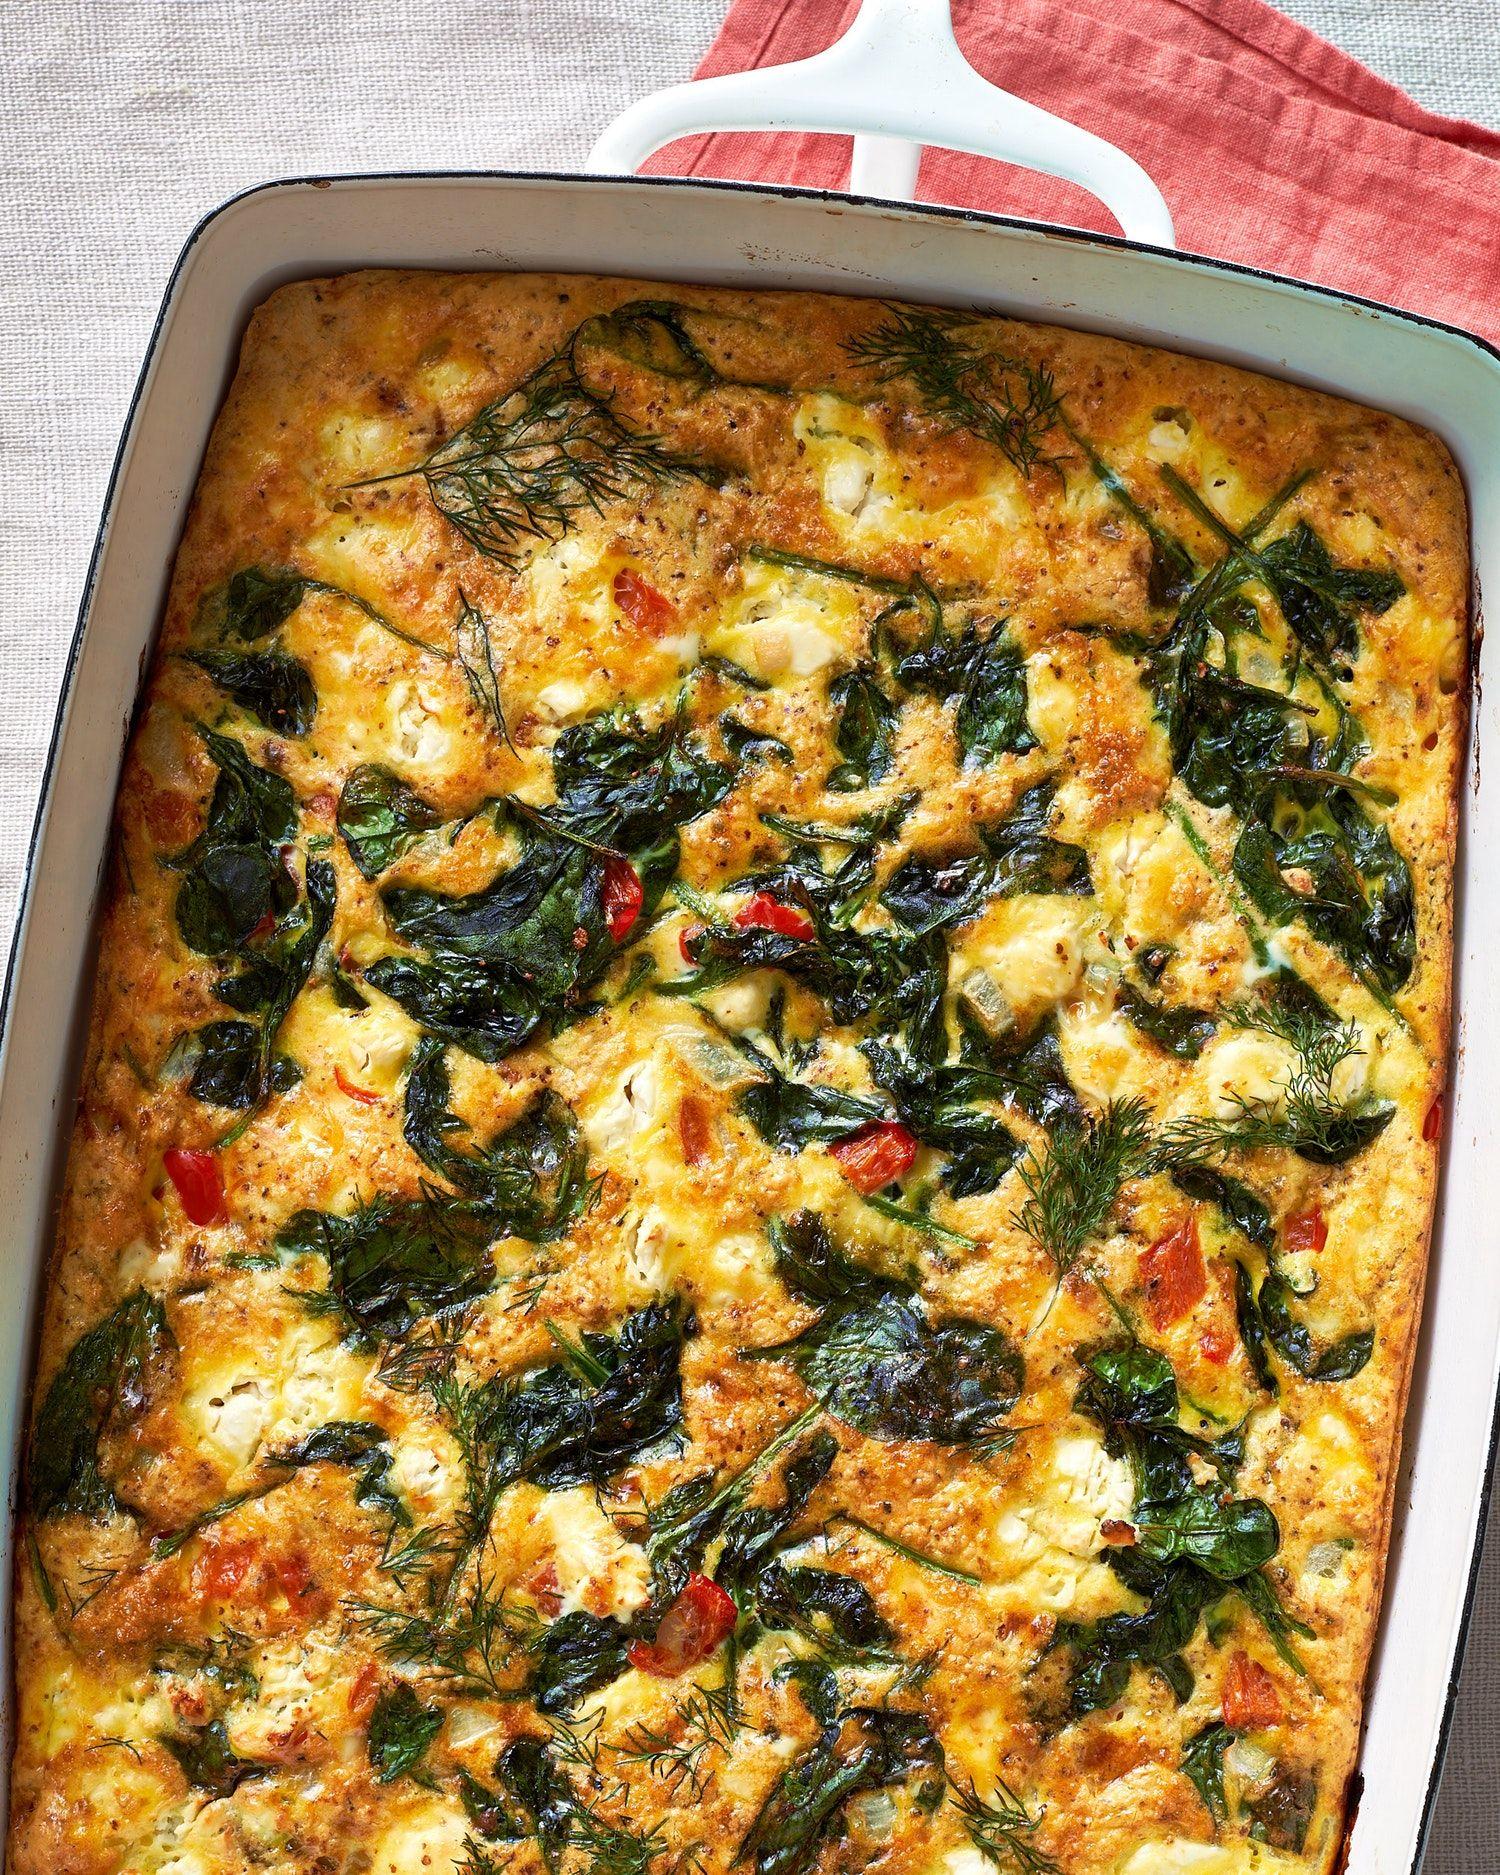 Make-Ahead Spinach And Feta Egg Casserole